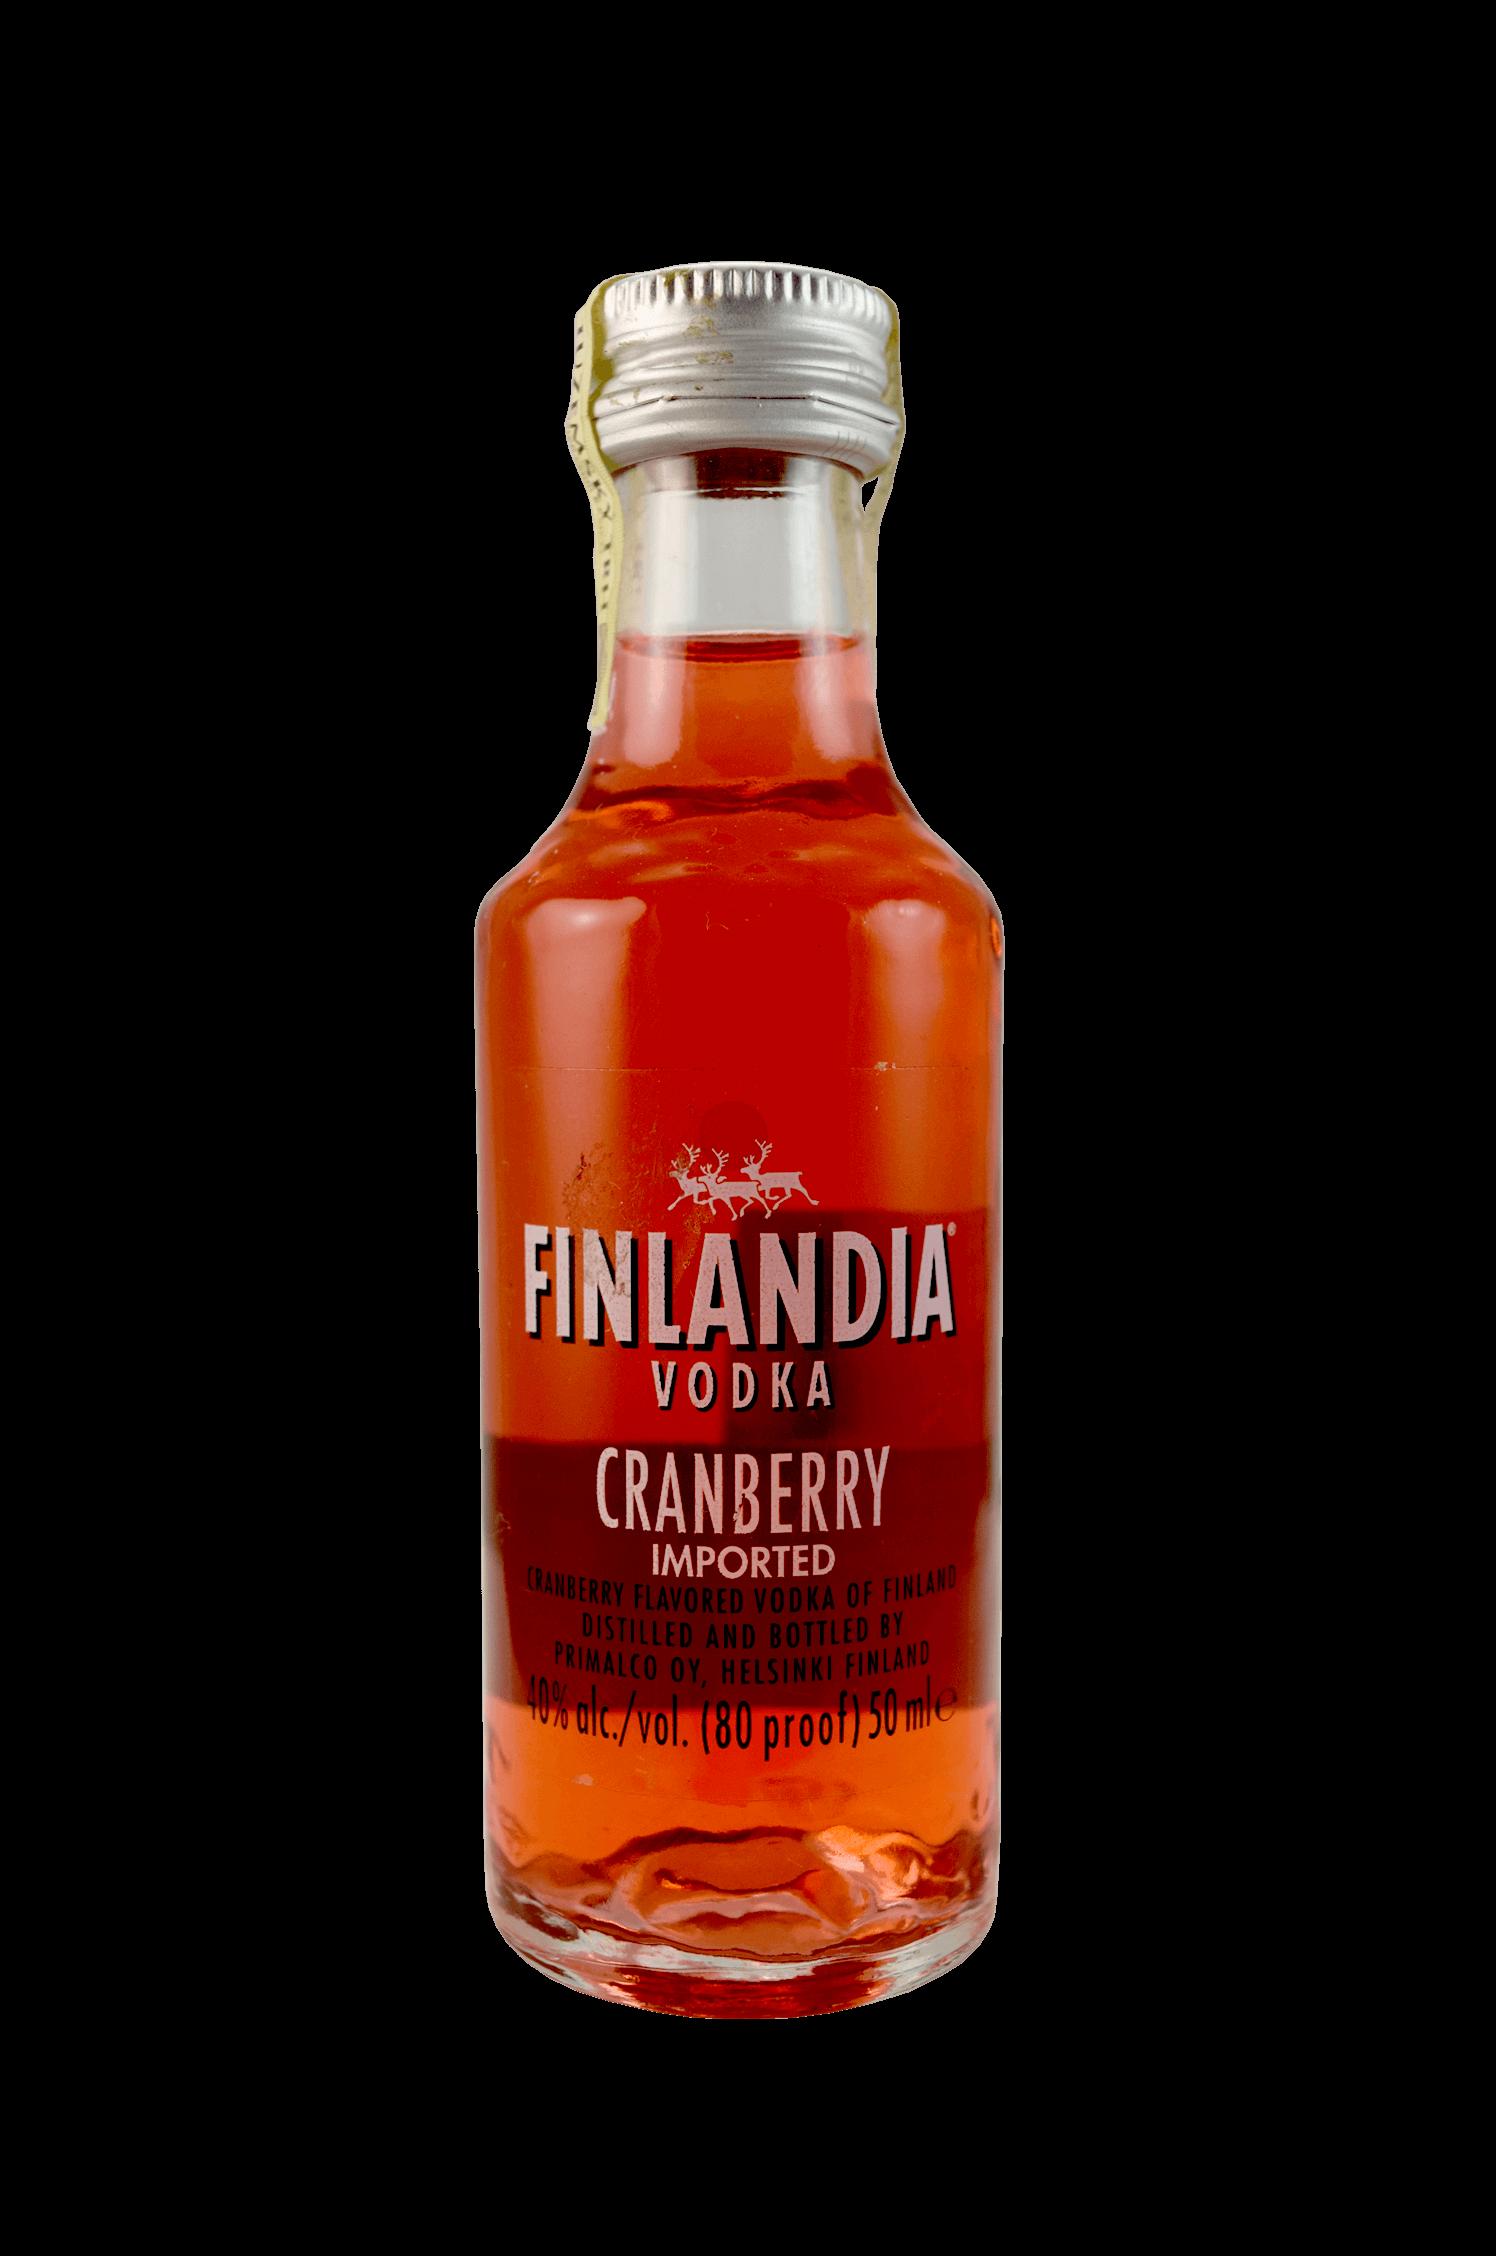 Finlandia Vodka Cranberry